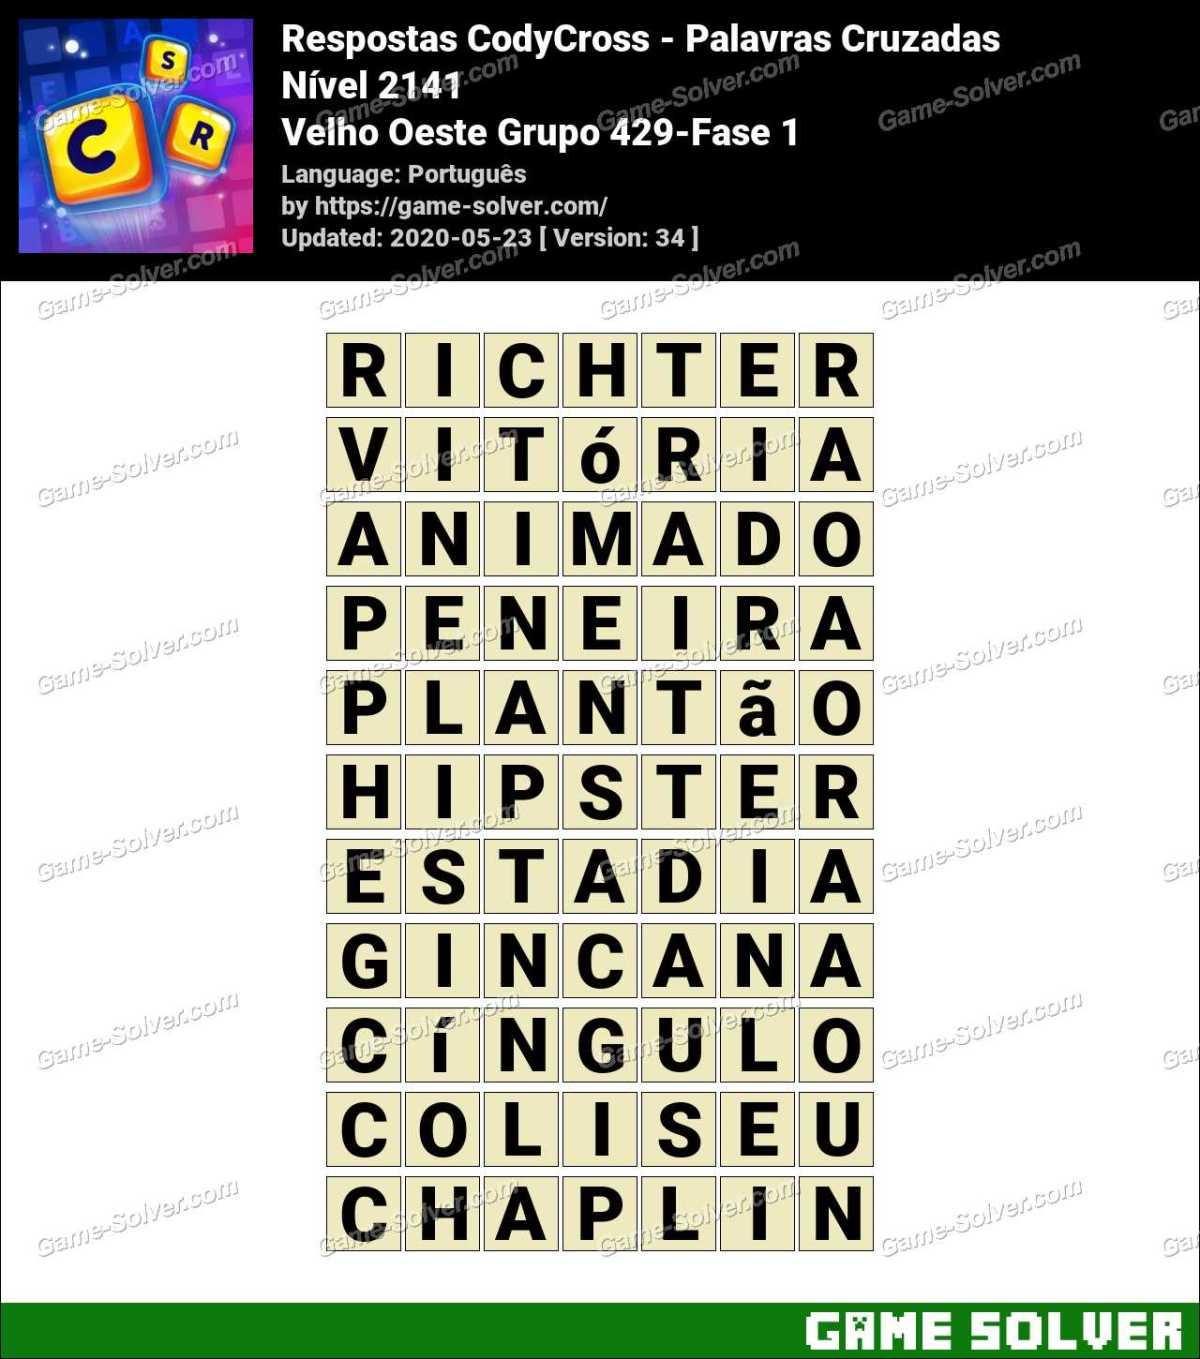 Respostas CodyCross Velho Oeste Grupo 429-Fase 1